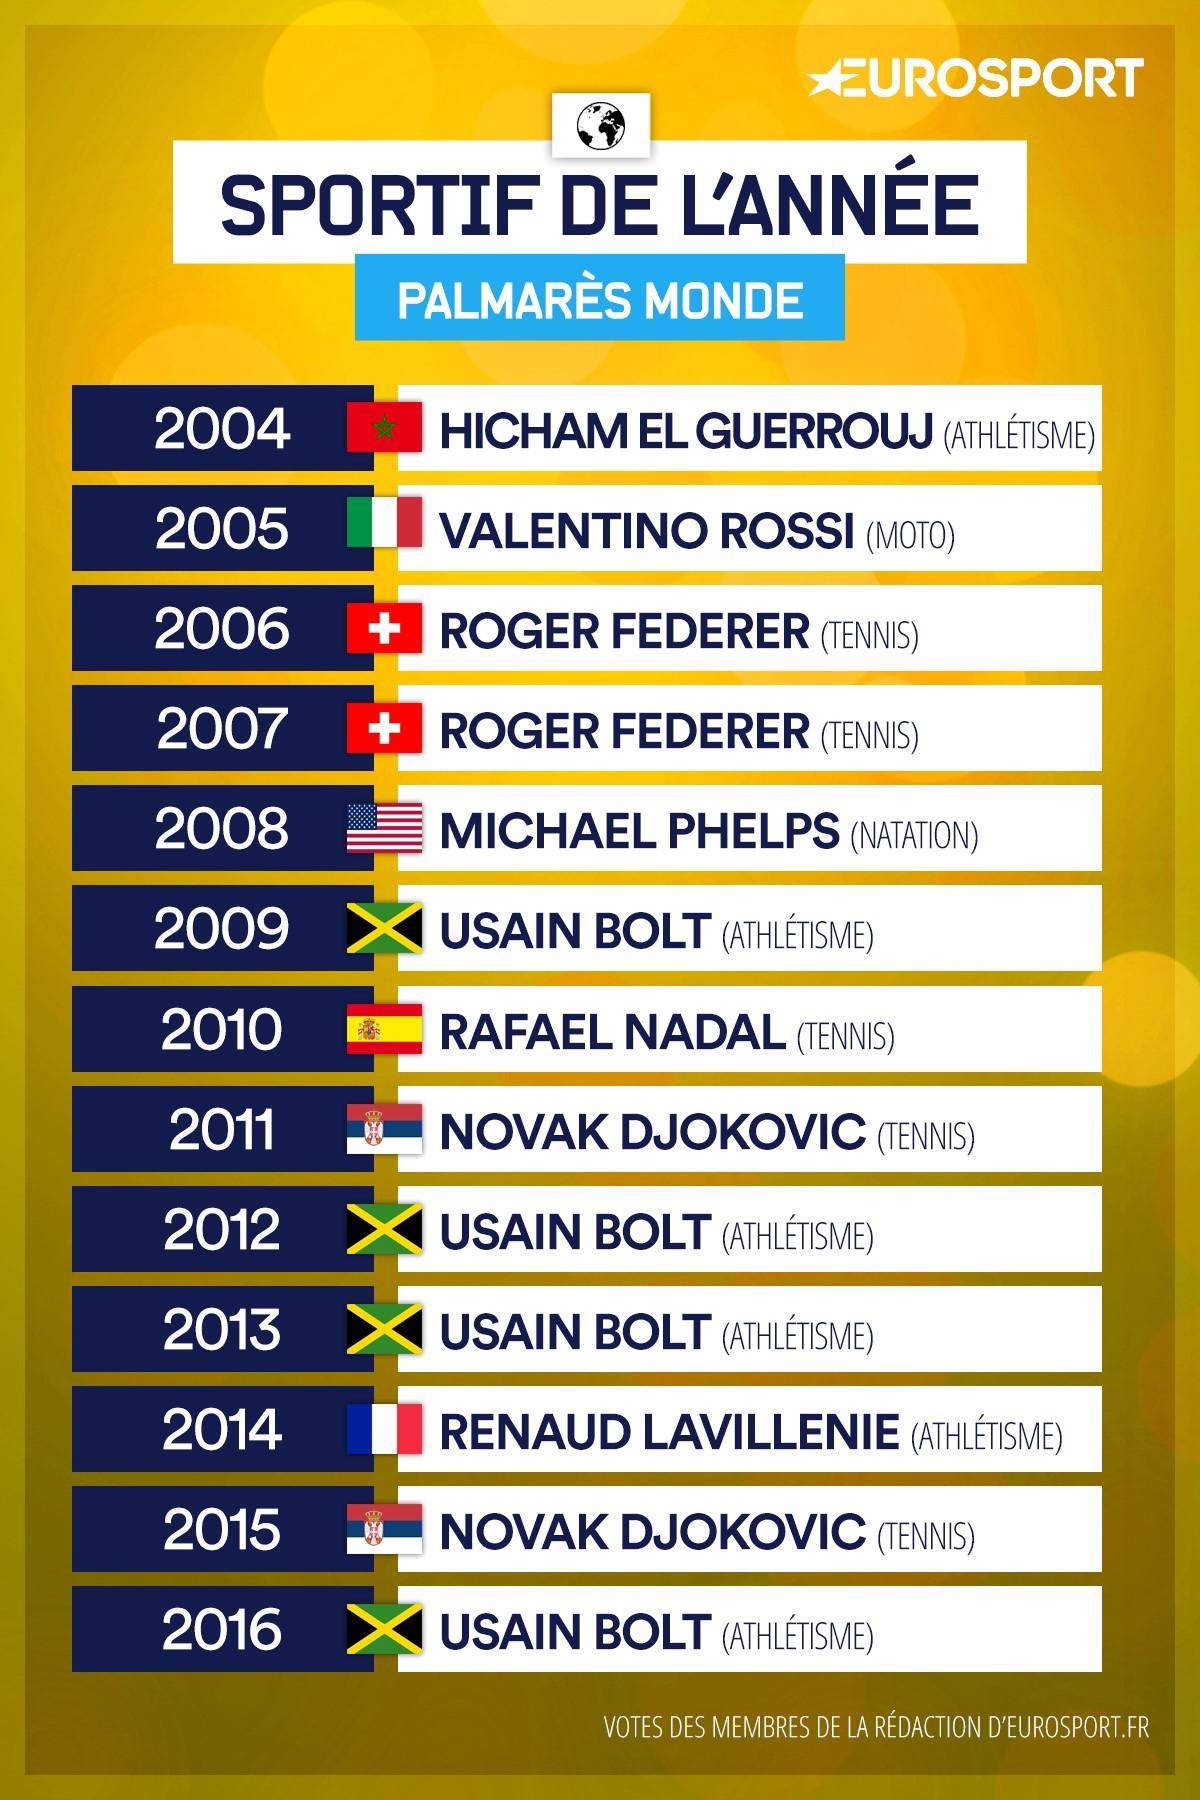 https://i.eurosport.com/2016/12/28/1993533.jpg